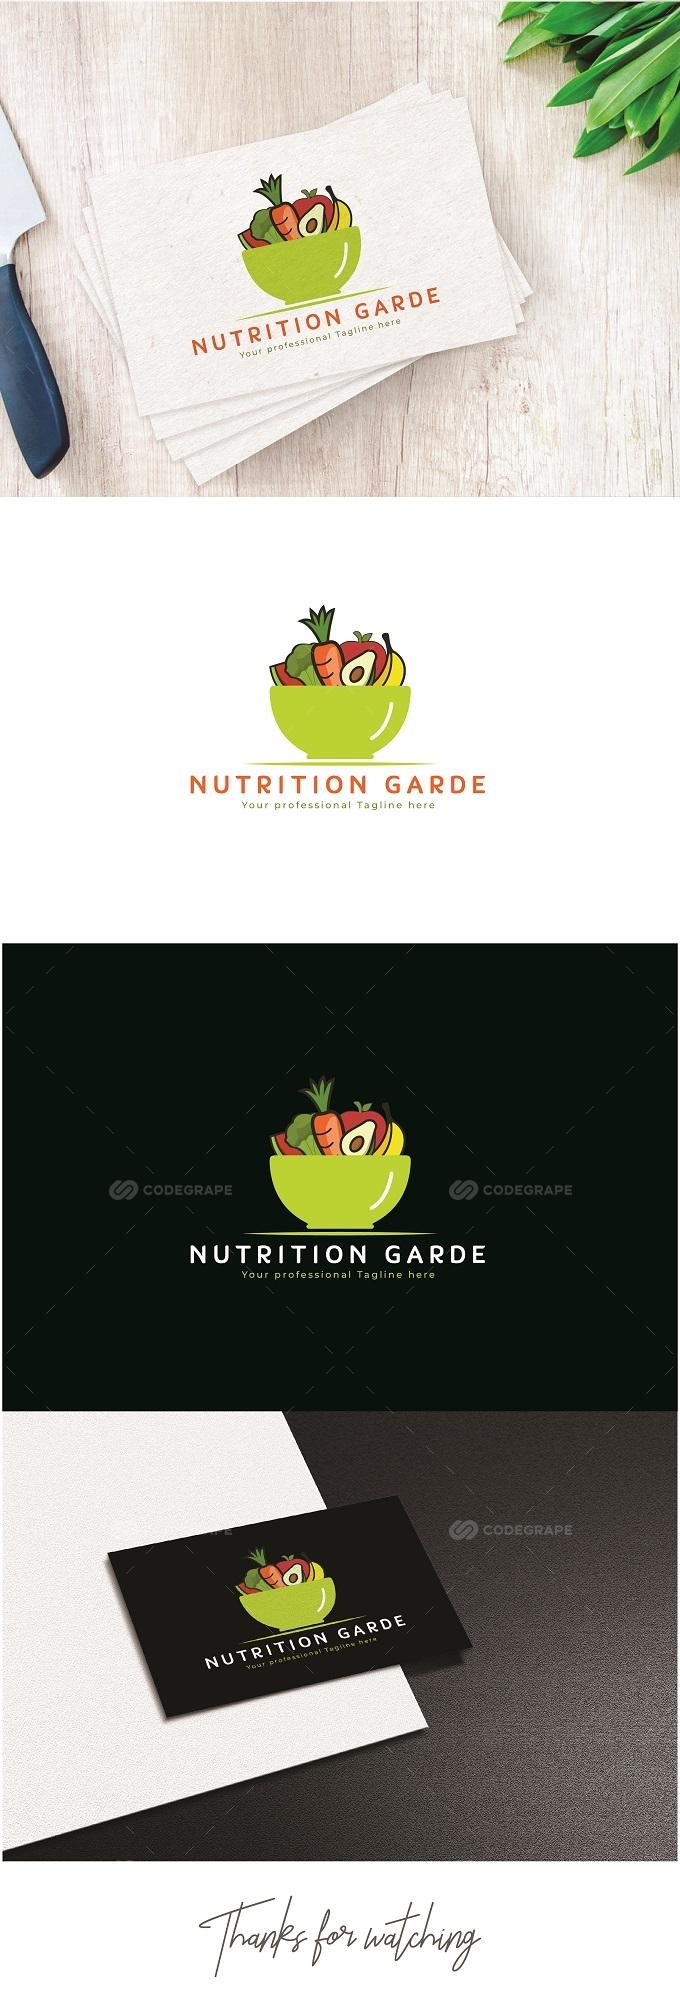 Nutrition Garde Logo Design